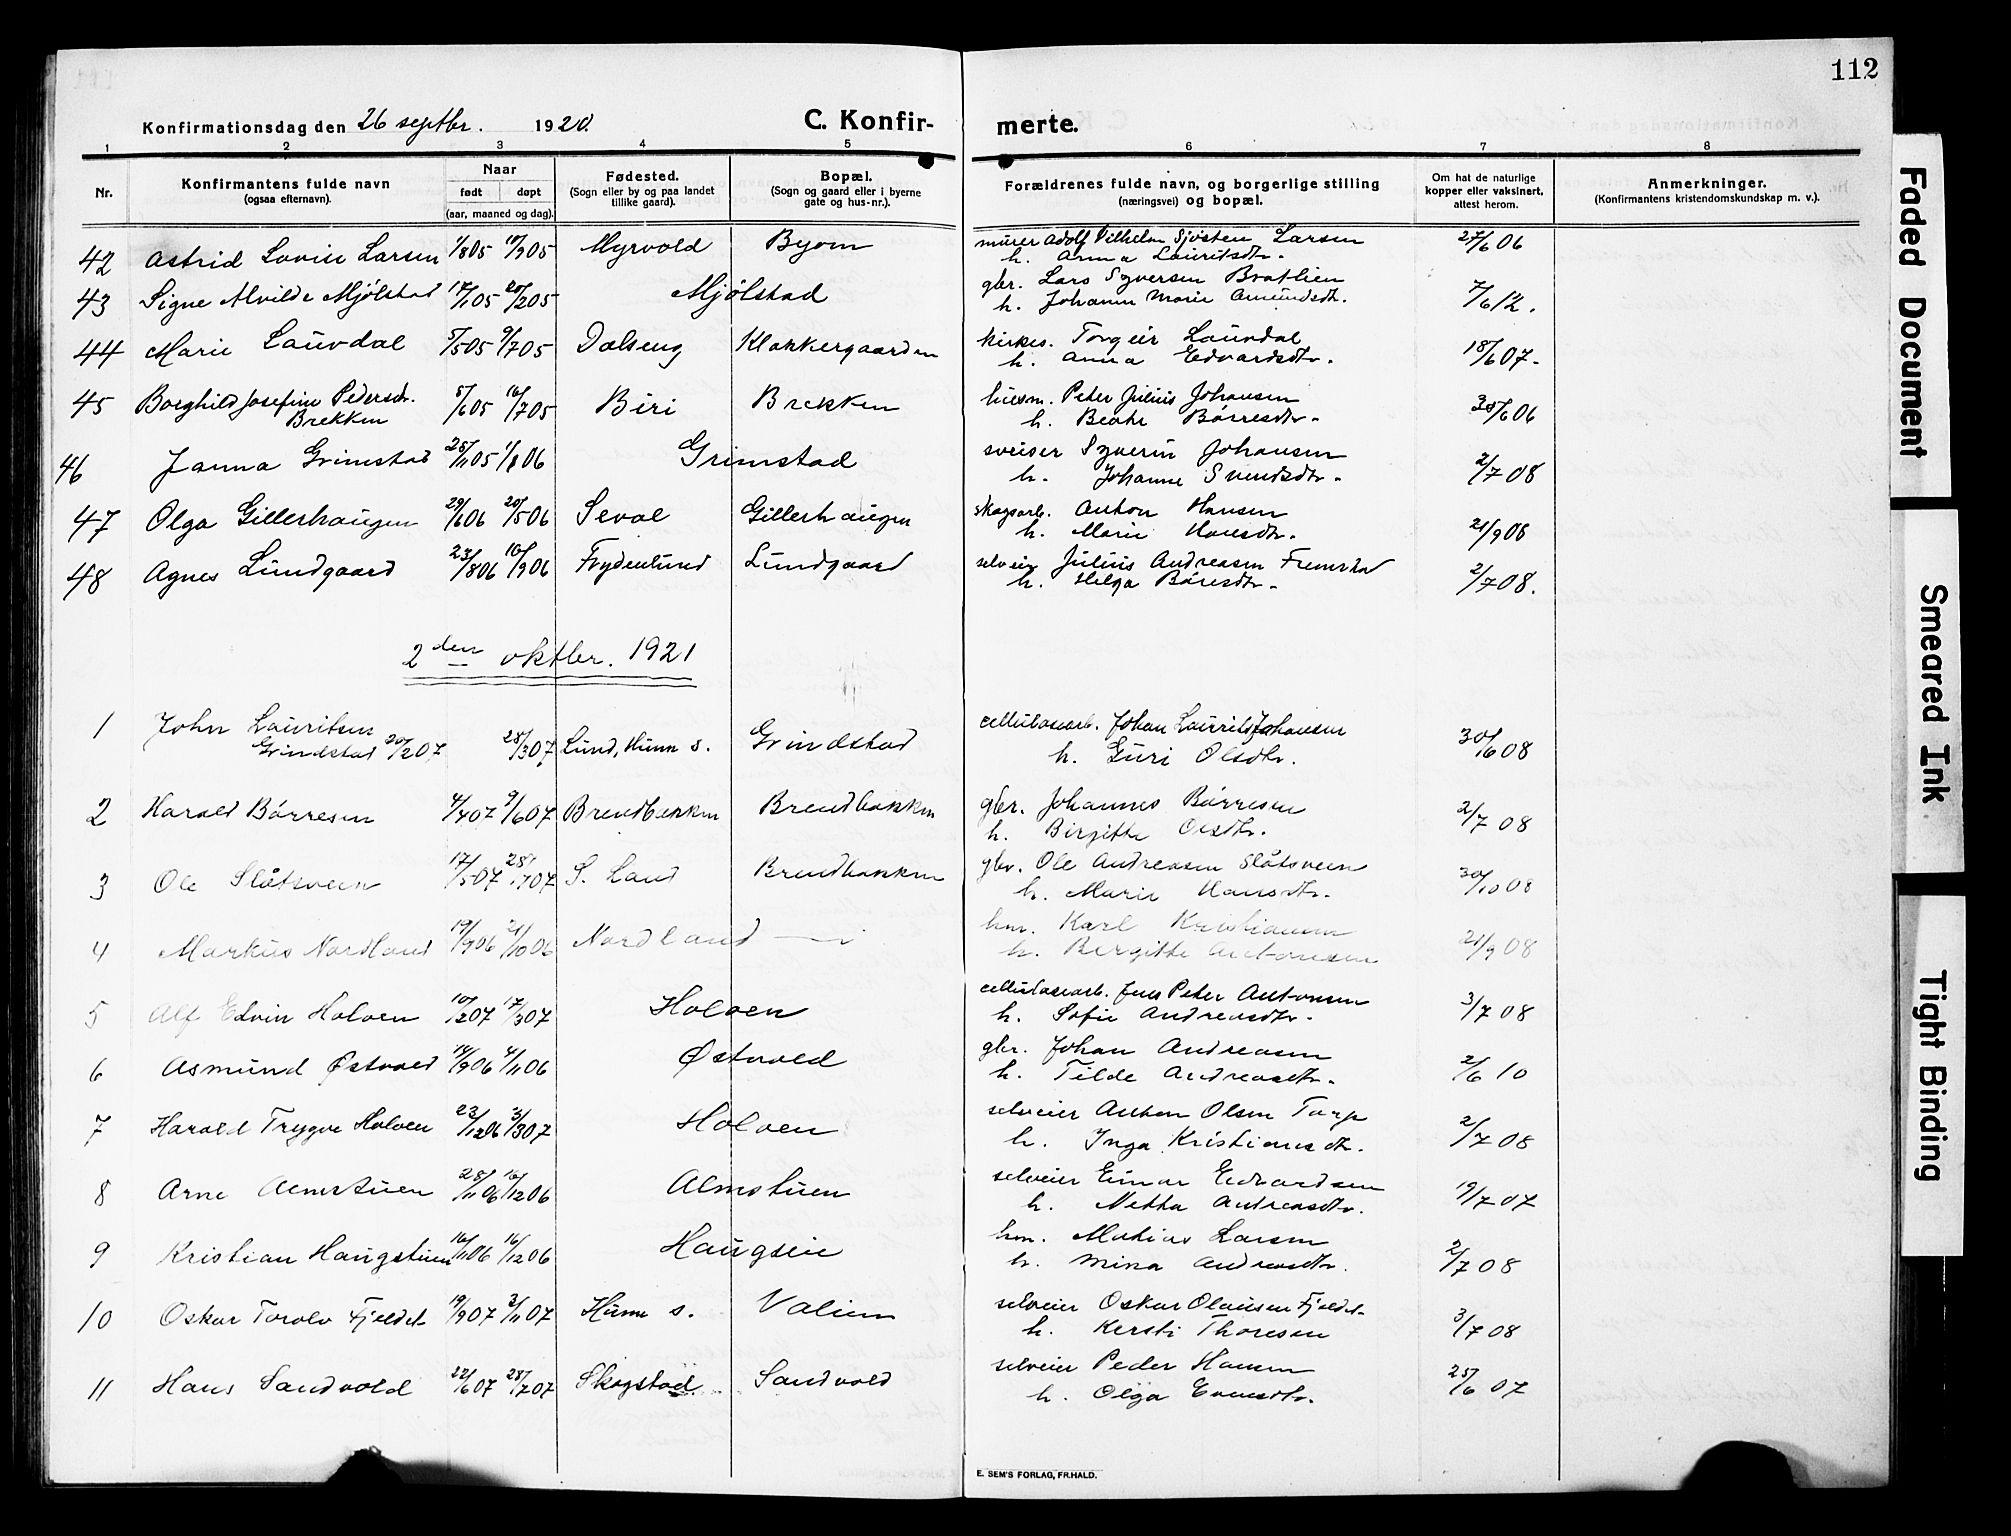 SAH, Vardal prestekontor, H/Ha/Hab/L0015: Klokkerbok nr. 15, 1914-1931, s. 112